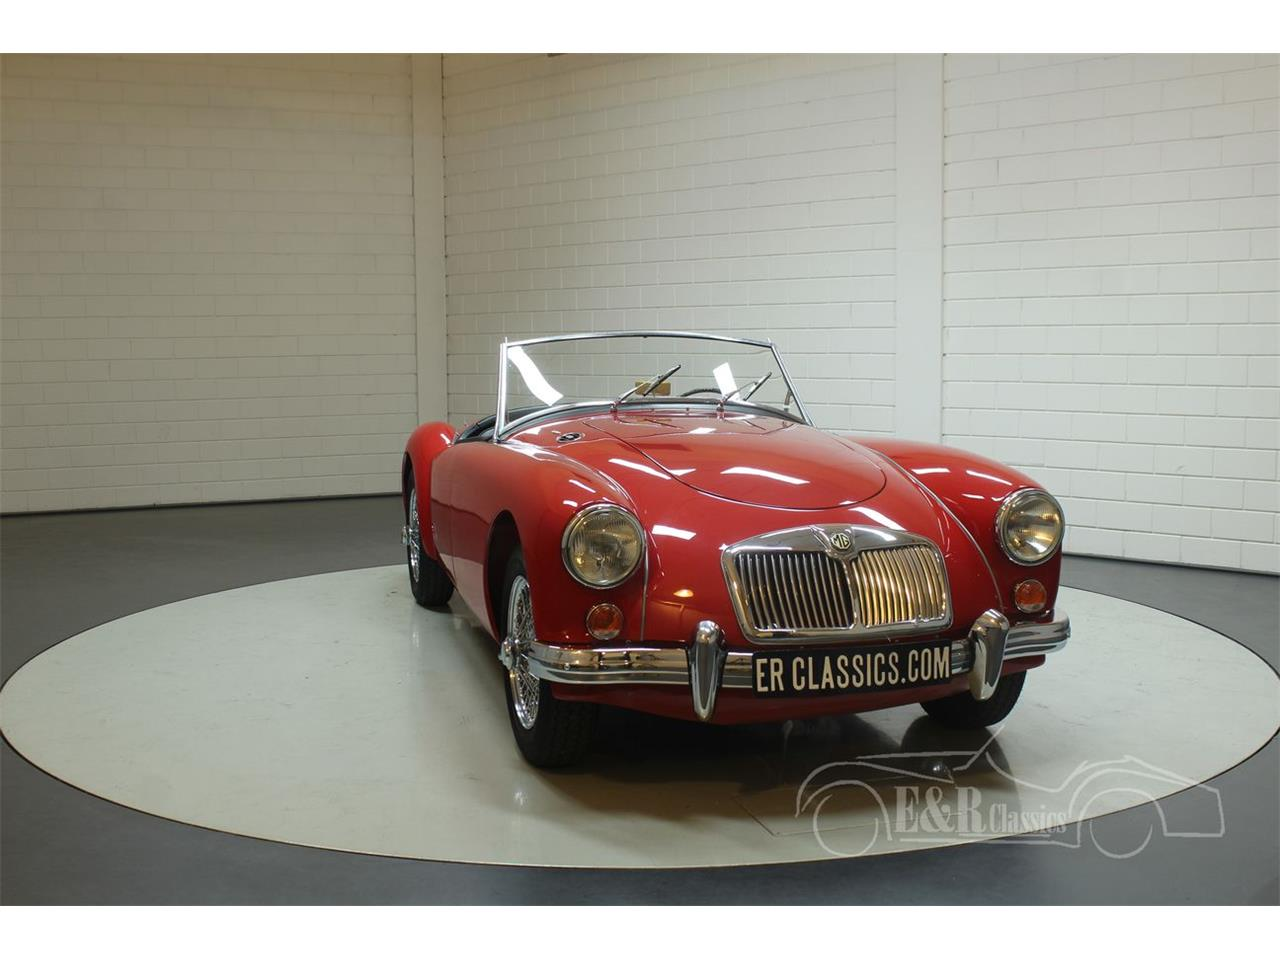 1959 MG MGA (CC-1230136) for sale in Waalwijk, noord brabant